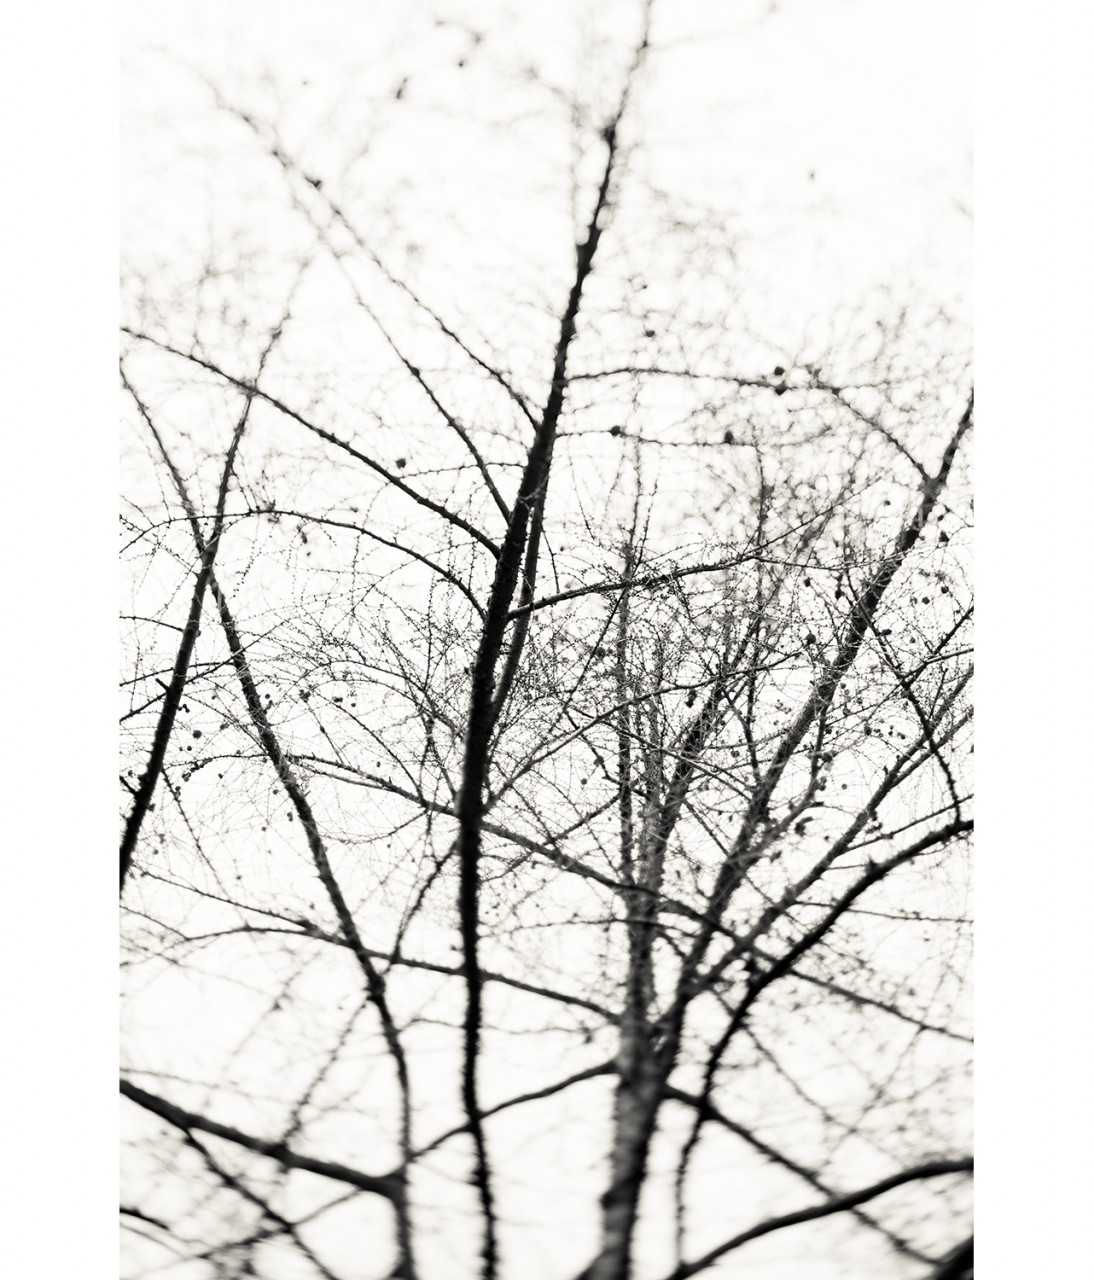 27_Untitled 1309